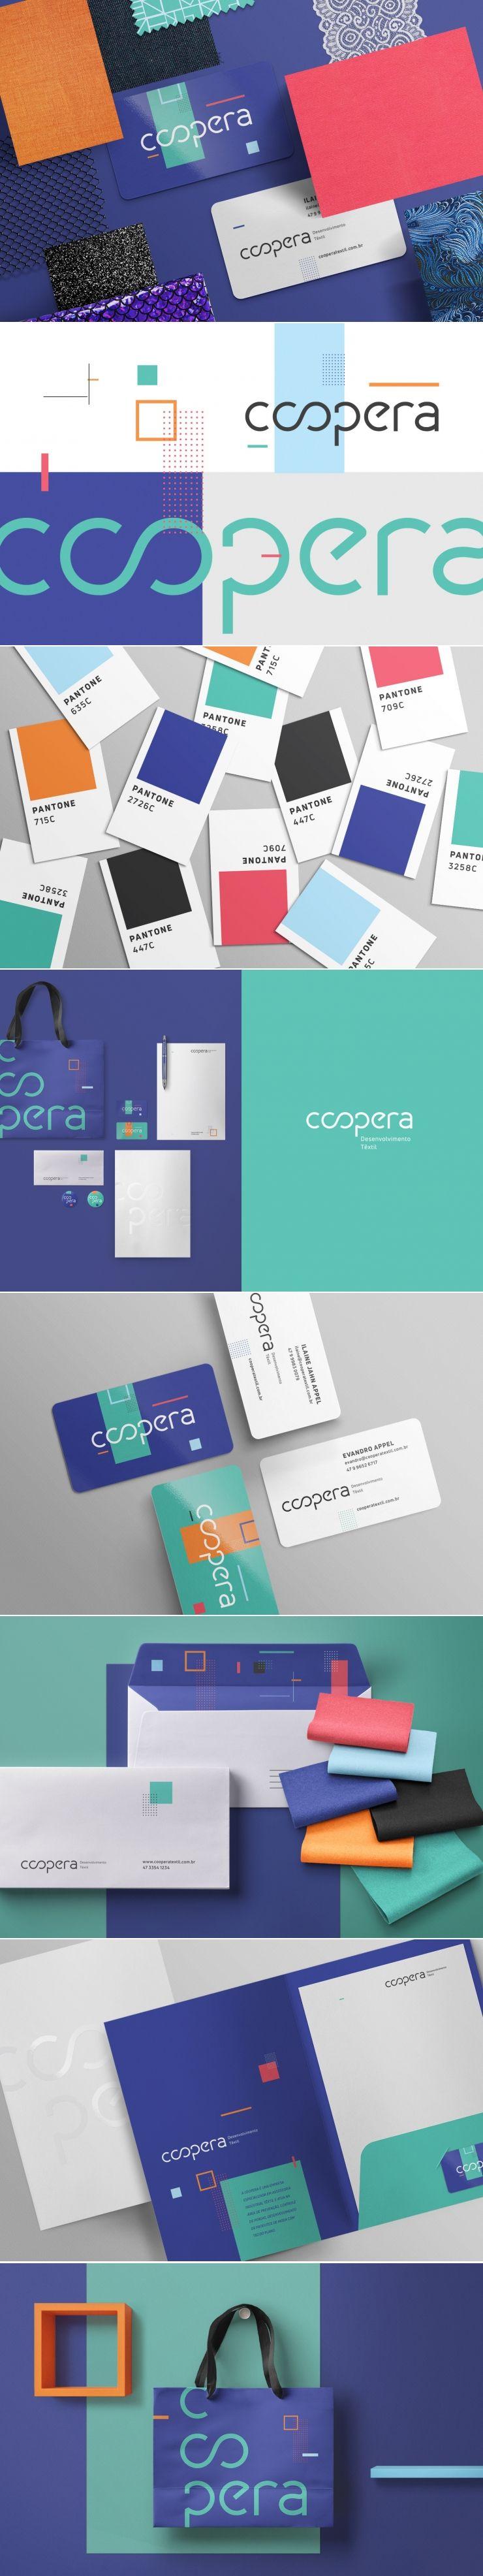 Coopera textile development brand identity by Ramona Katcheika